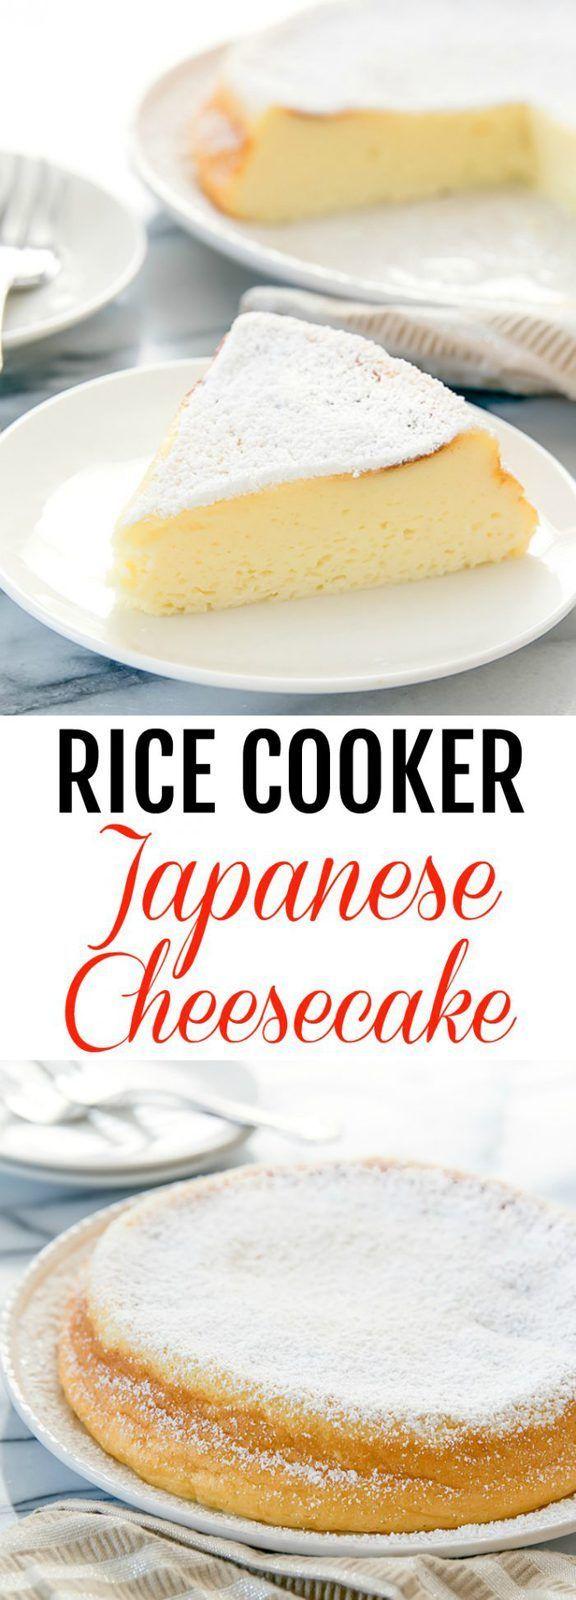 Rice Cooker Japanese Cheesecake